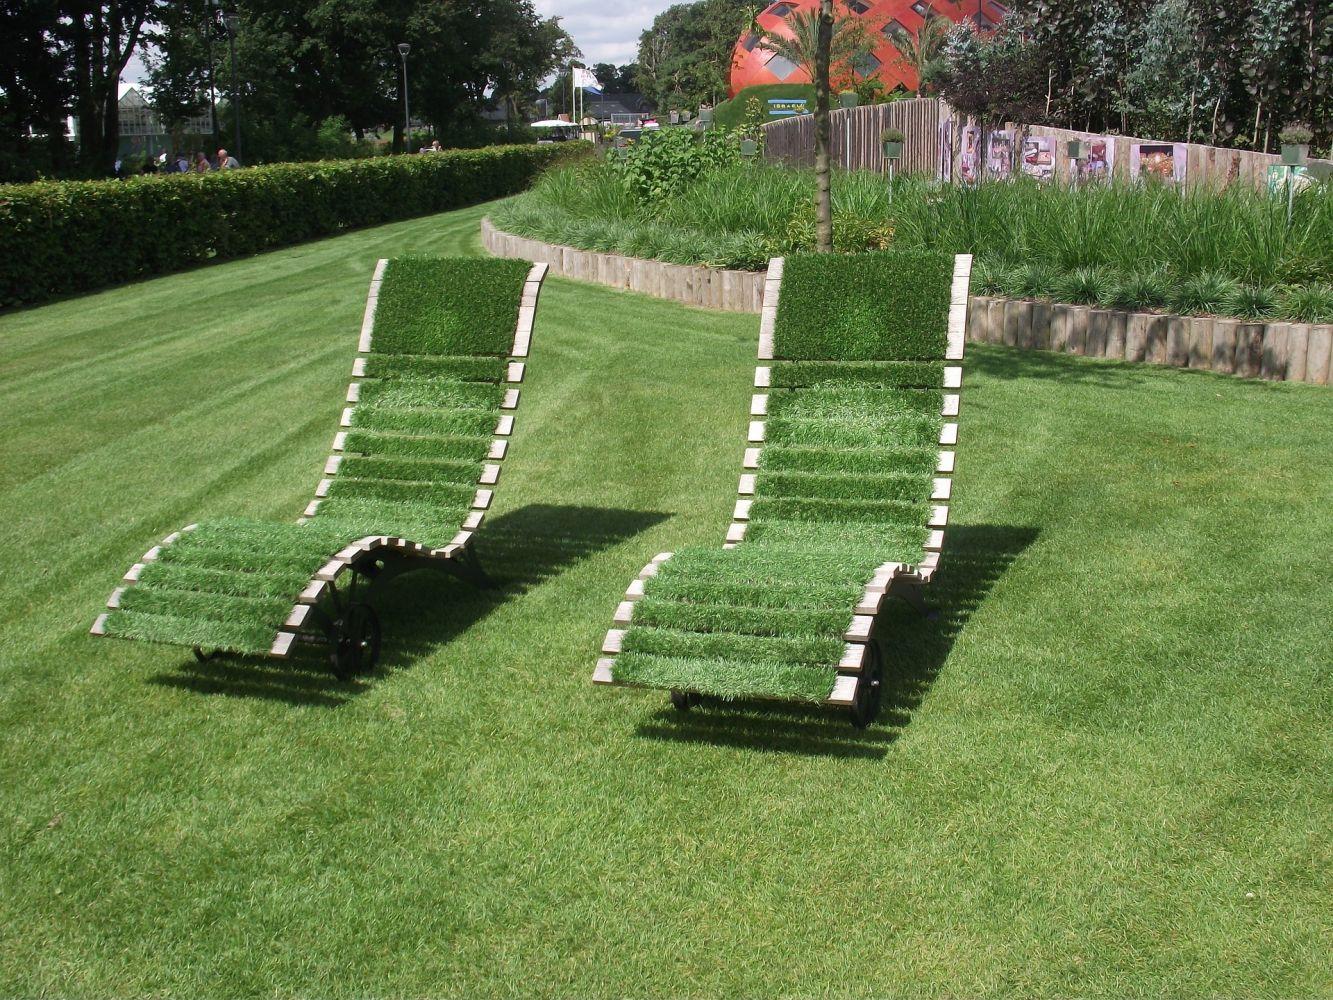 Gazon naturel pr t poser pour embellir son jardin - Desherbant naturel pour gazon ...